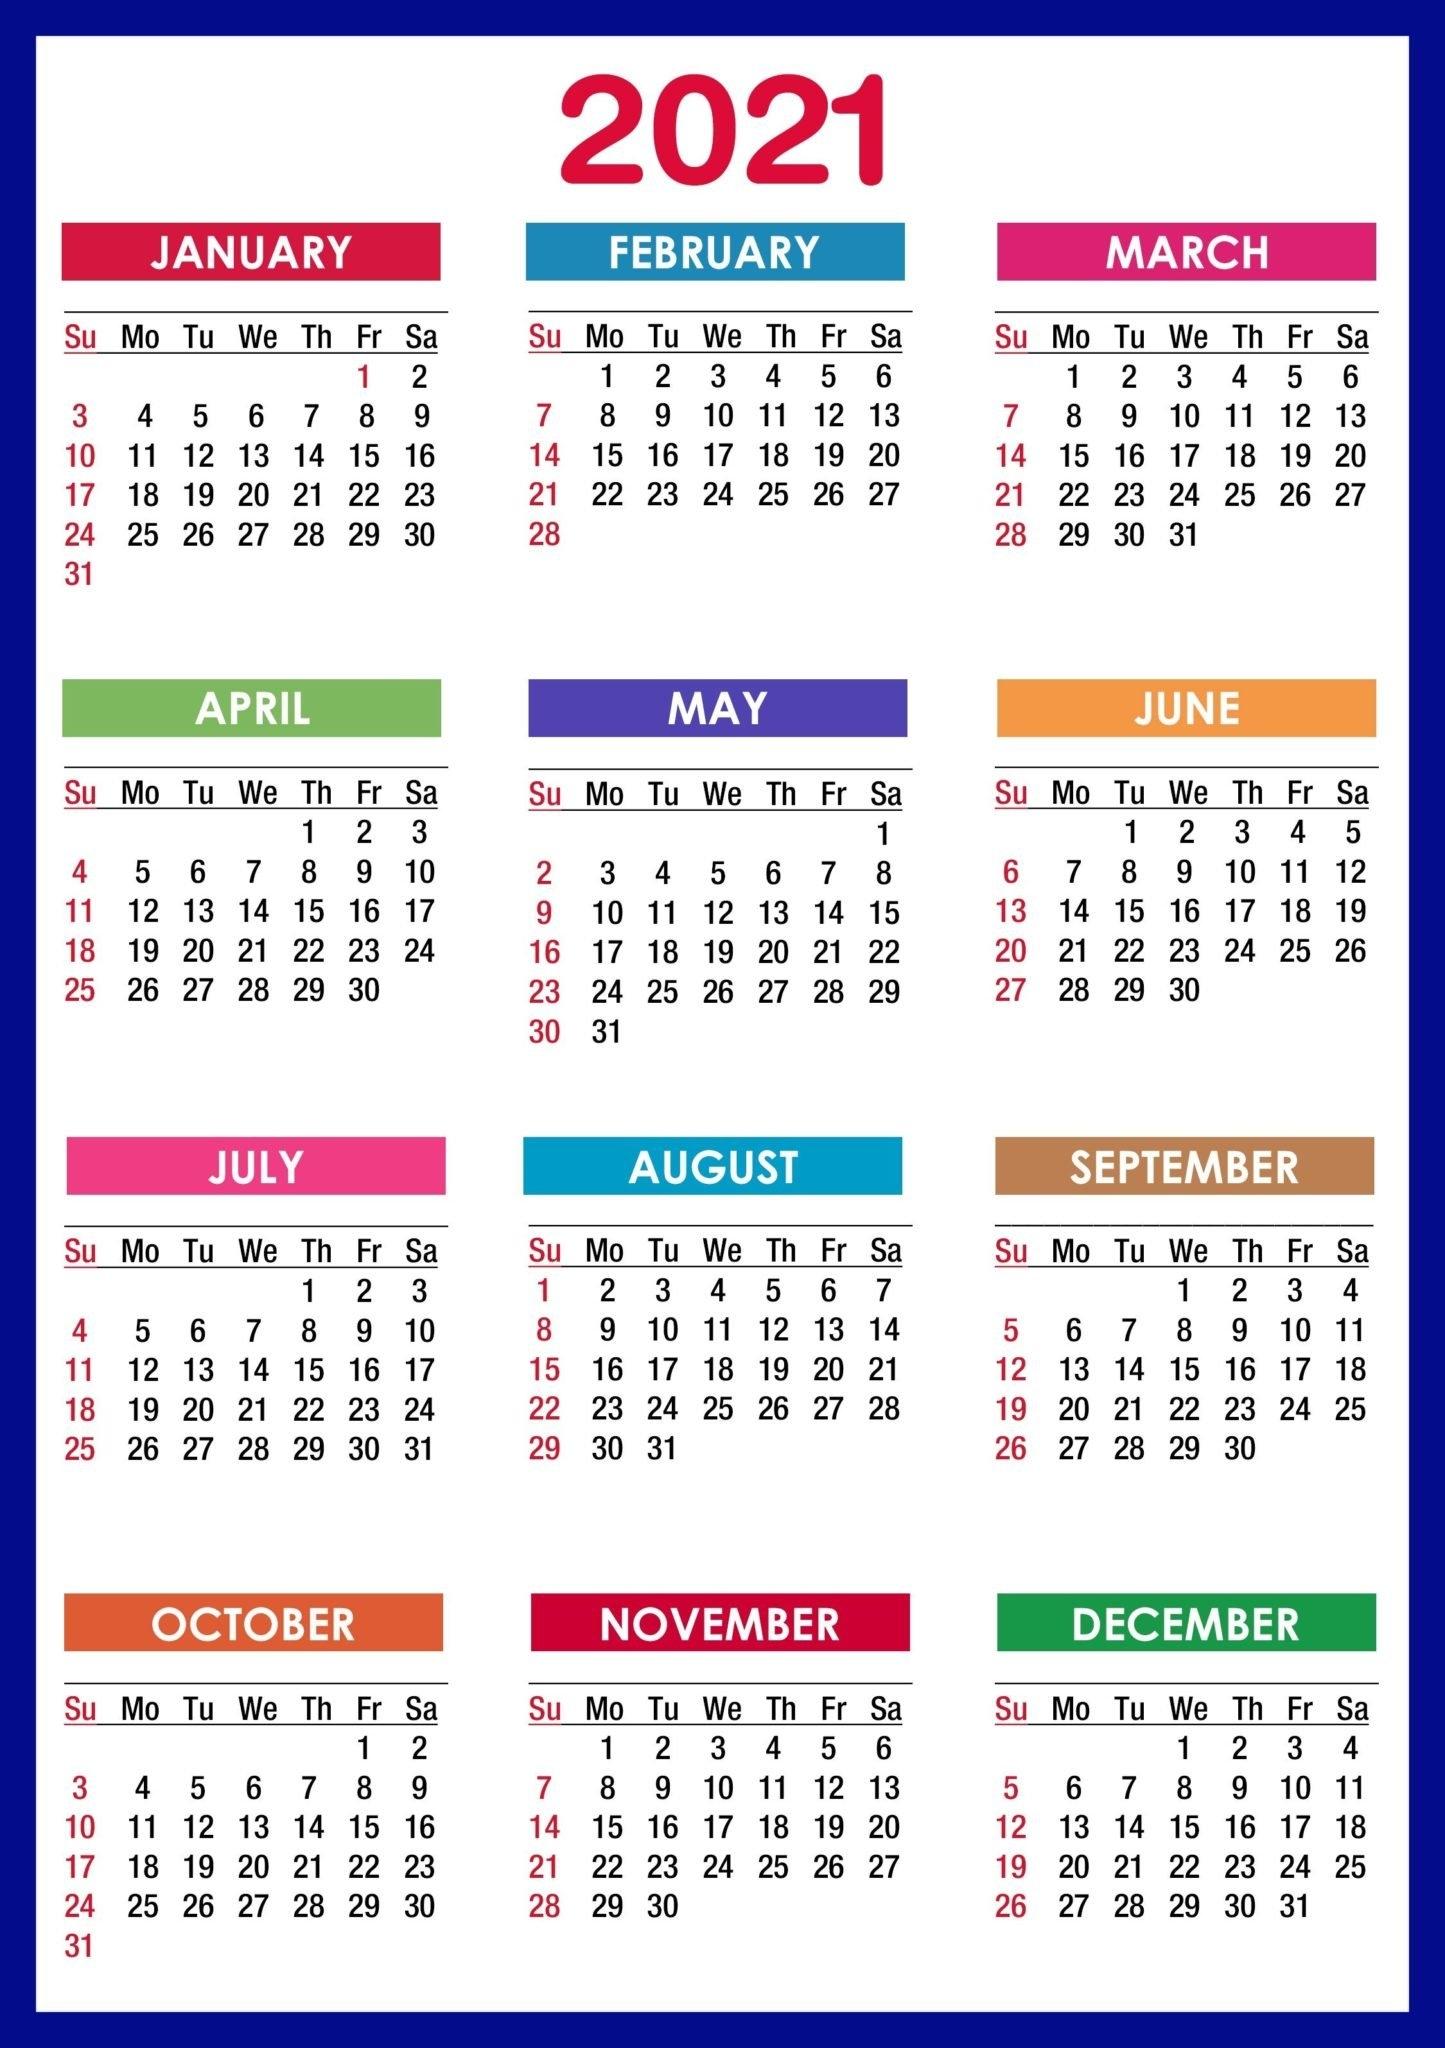 2021 Calendar With Holidays Usa, Uk, Canada, Australia within 2021 Calendar Template Excel Australia Photo